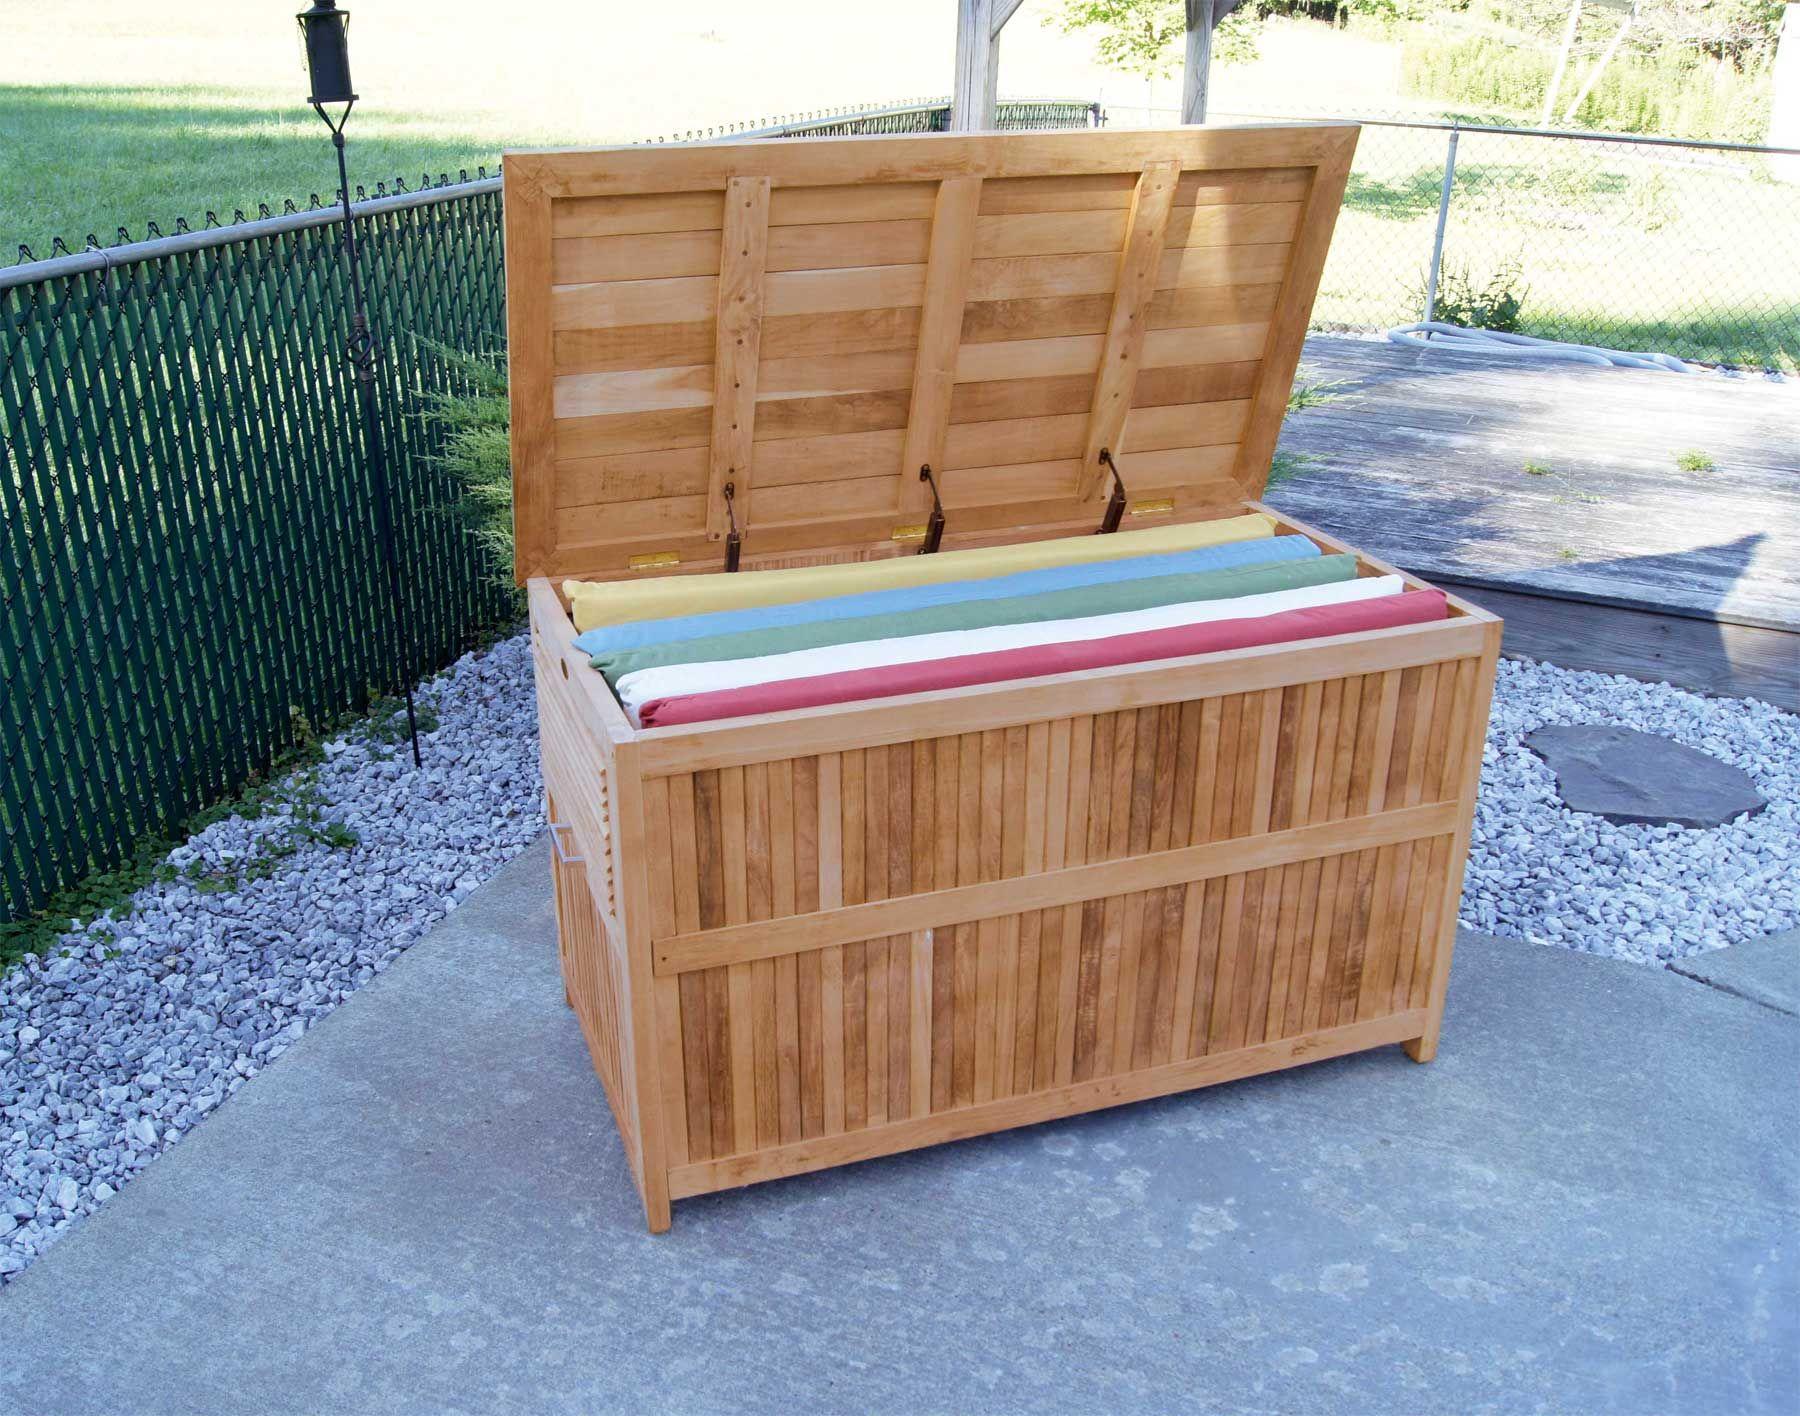 Teak Outdoor Patio Deck Storage Box for Outdoor Furniture Cushions & Teak Outdoor Patio Deck Storage Box for Outdoor Furniture Cushions ...